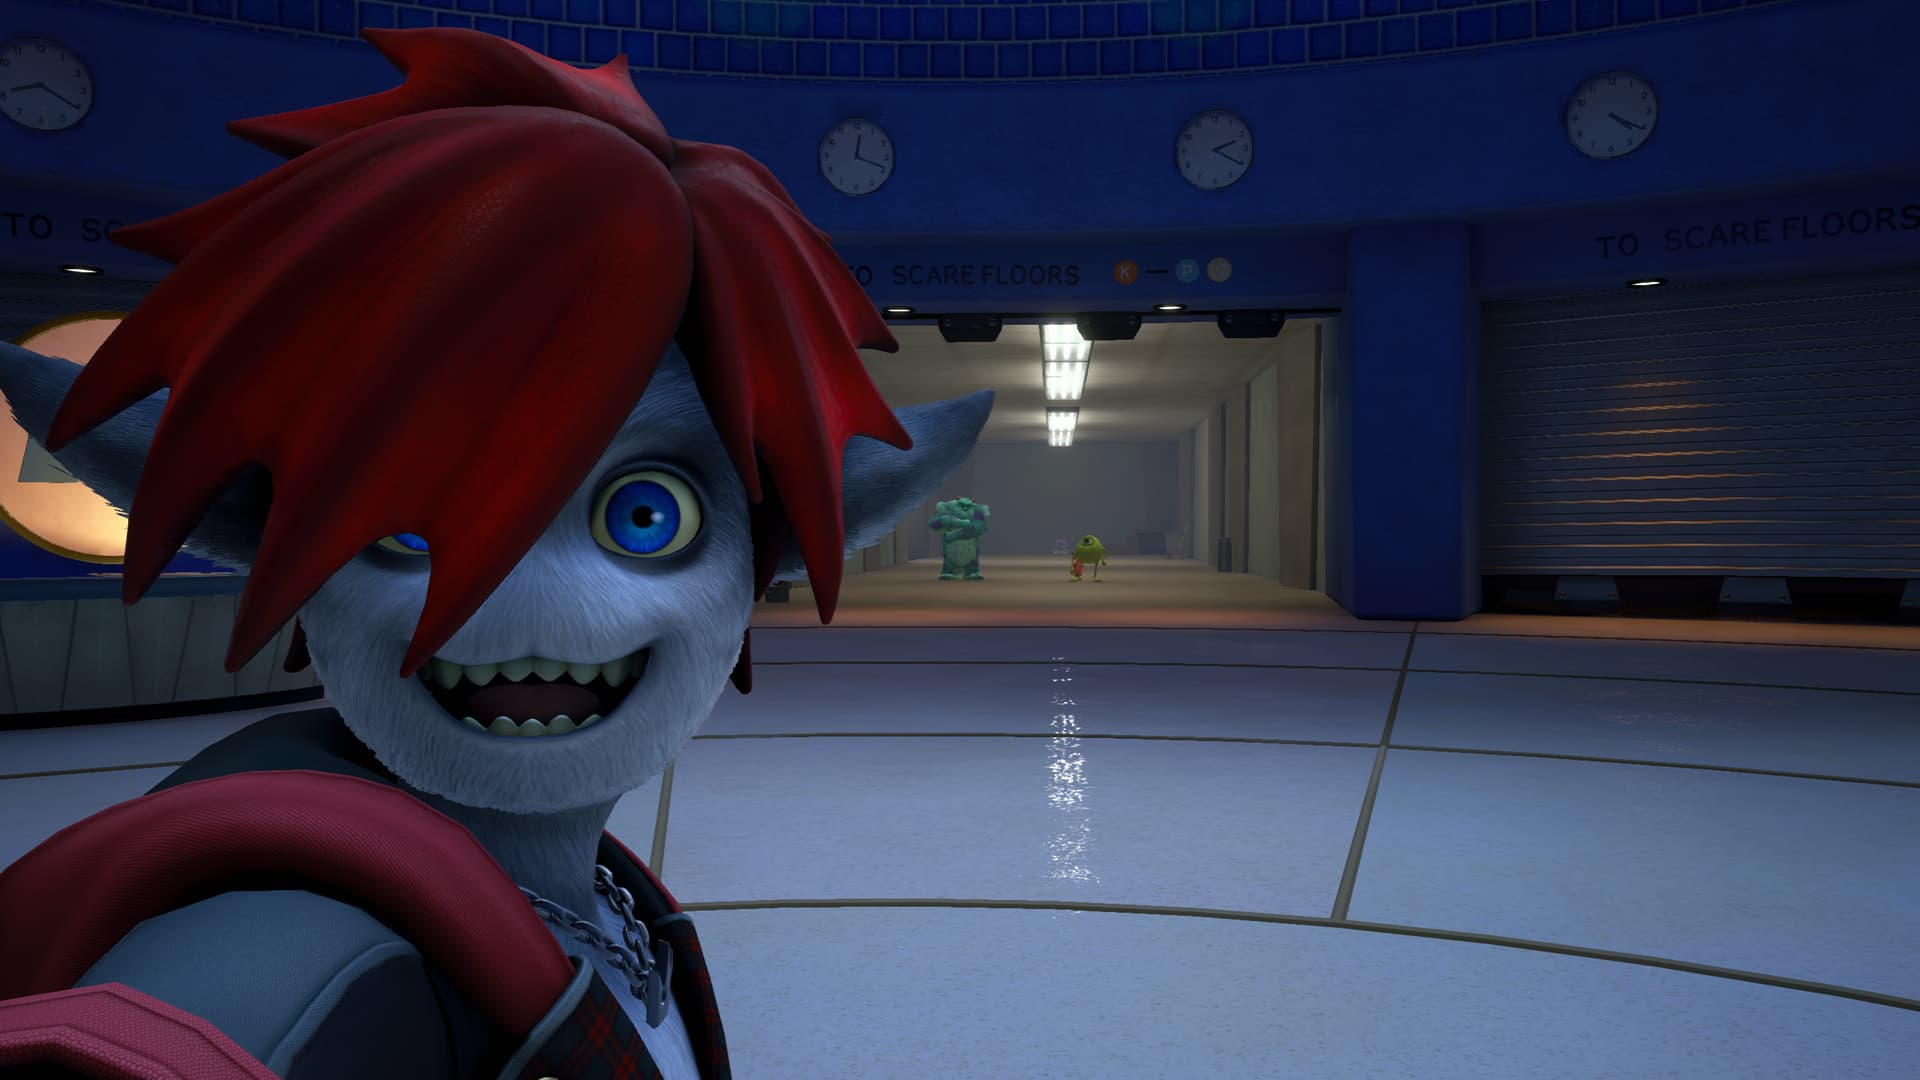 Análisis de Kingdom Hearts III - Xbox One 2